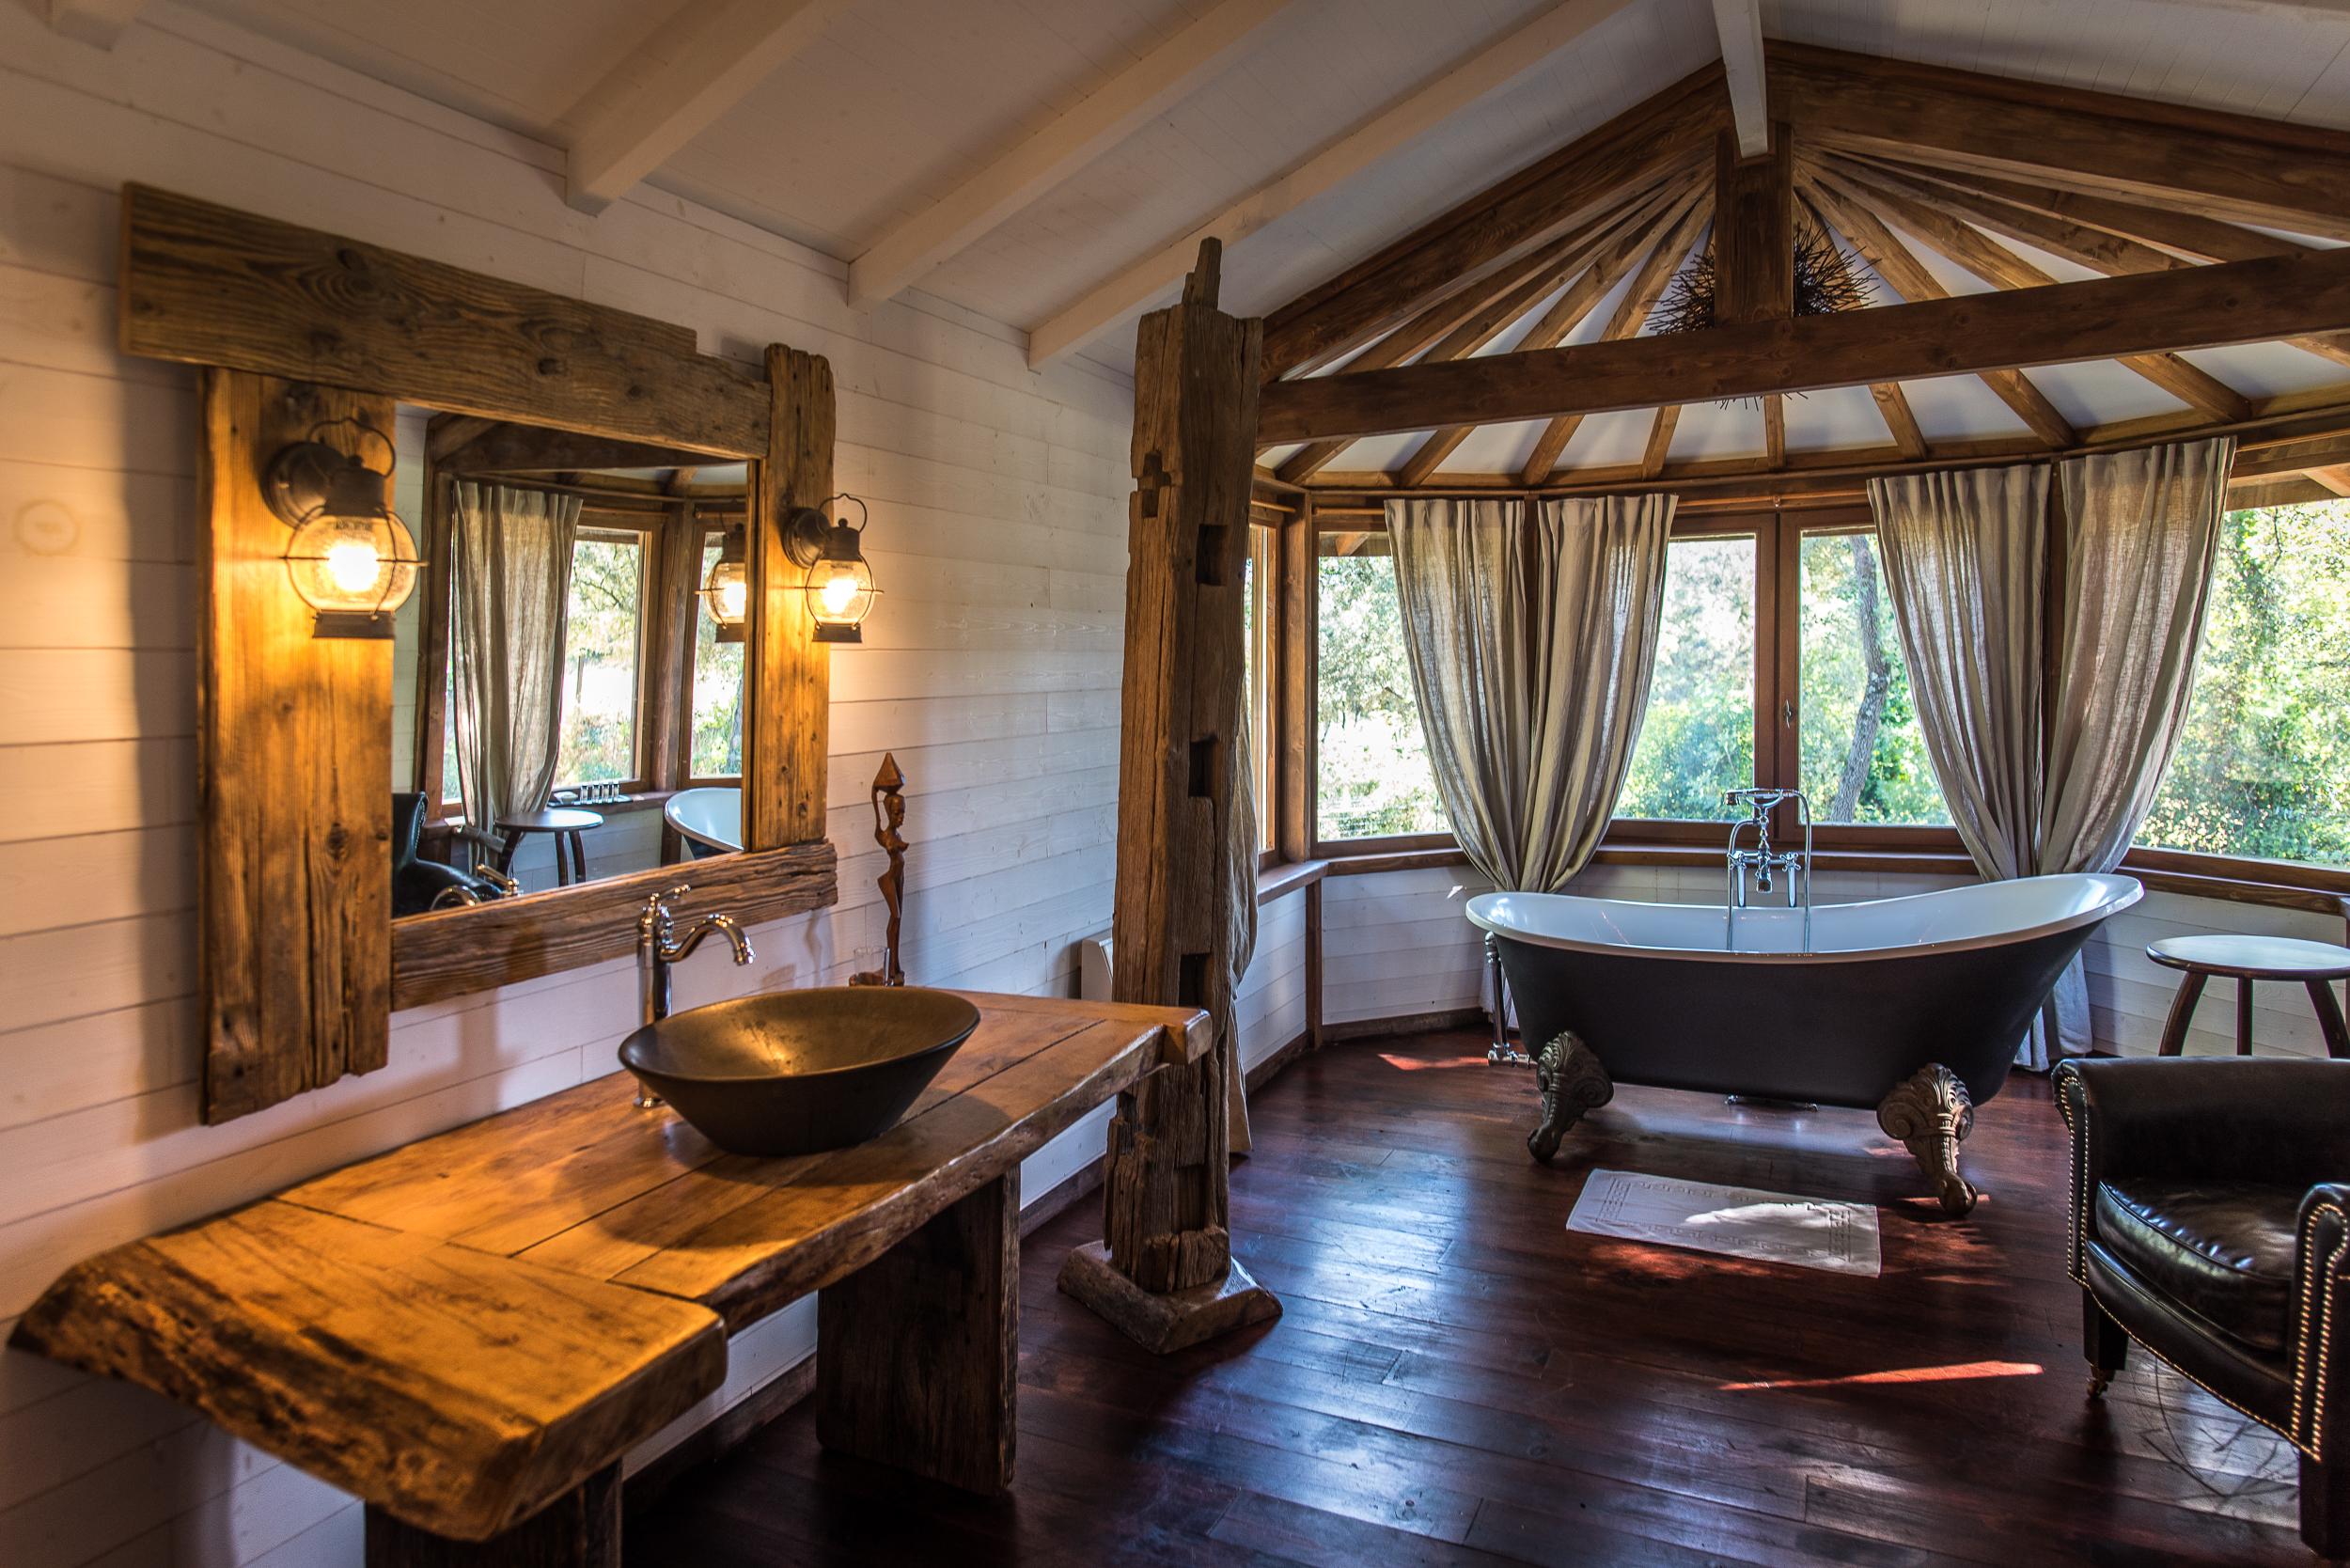 http://www.villa-vanille.com/wp-content/uploads/2017/07/nivaquin-salle_de_bain_villa_vanille_chambre_dhote_de_charme_boisseron_herault.jpg